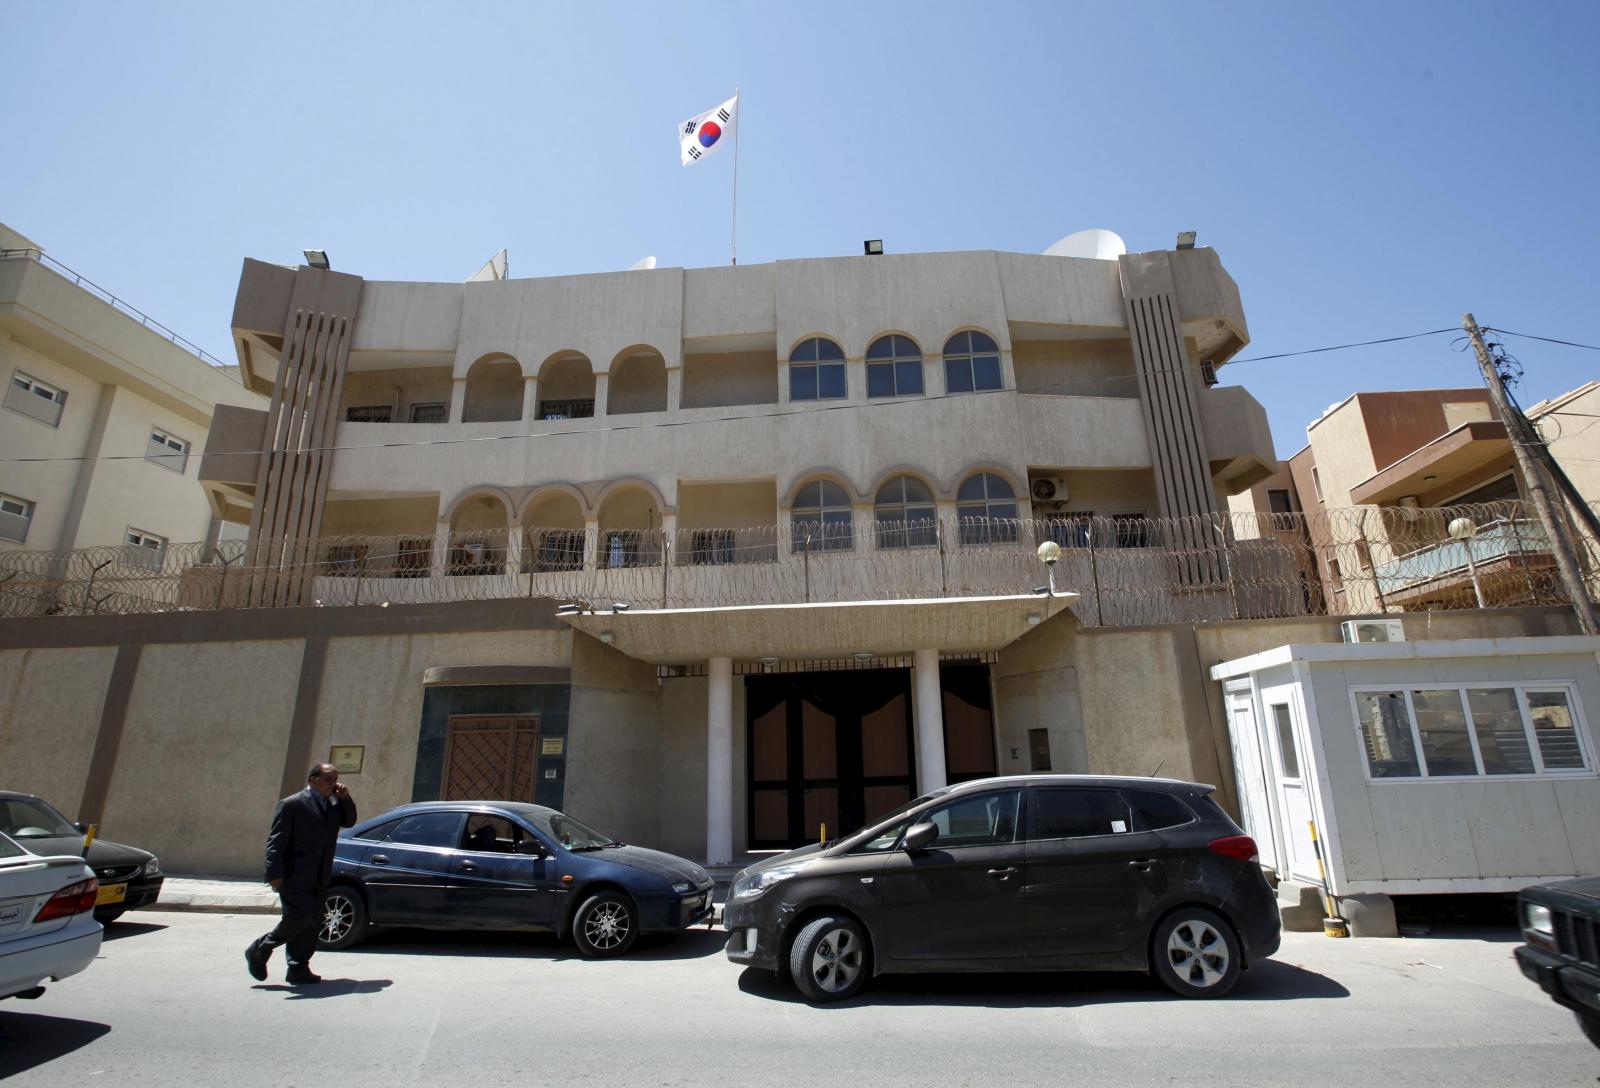 Isis attack embassies in Libya